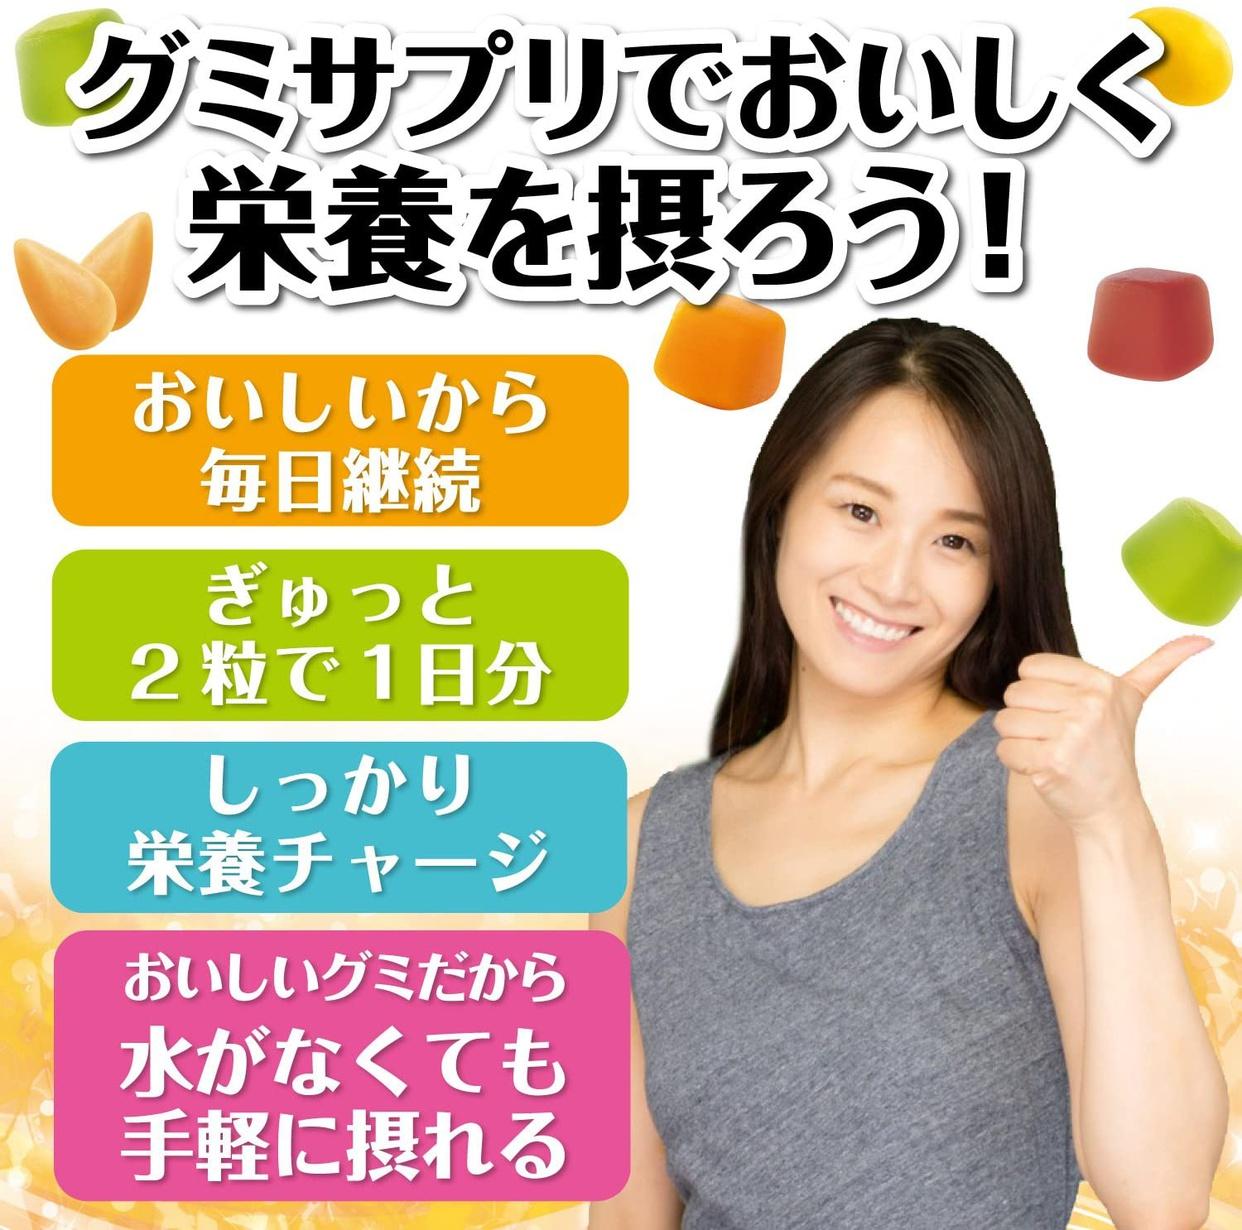 UHA味覚糖 グミサプリ 大豆イソフラボンの商品画像5